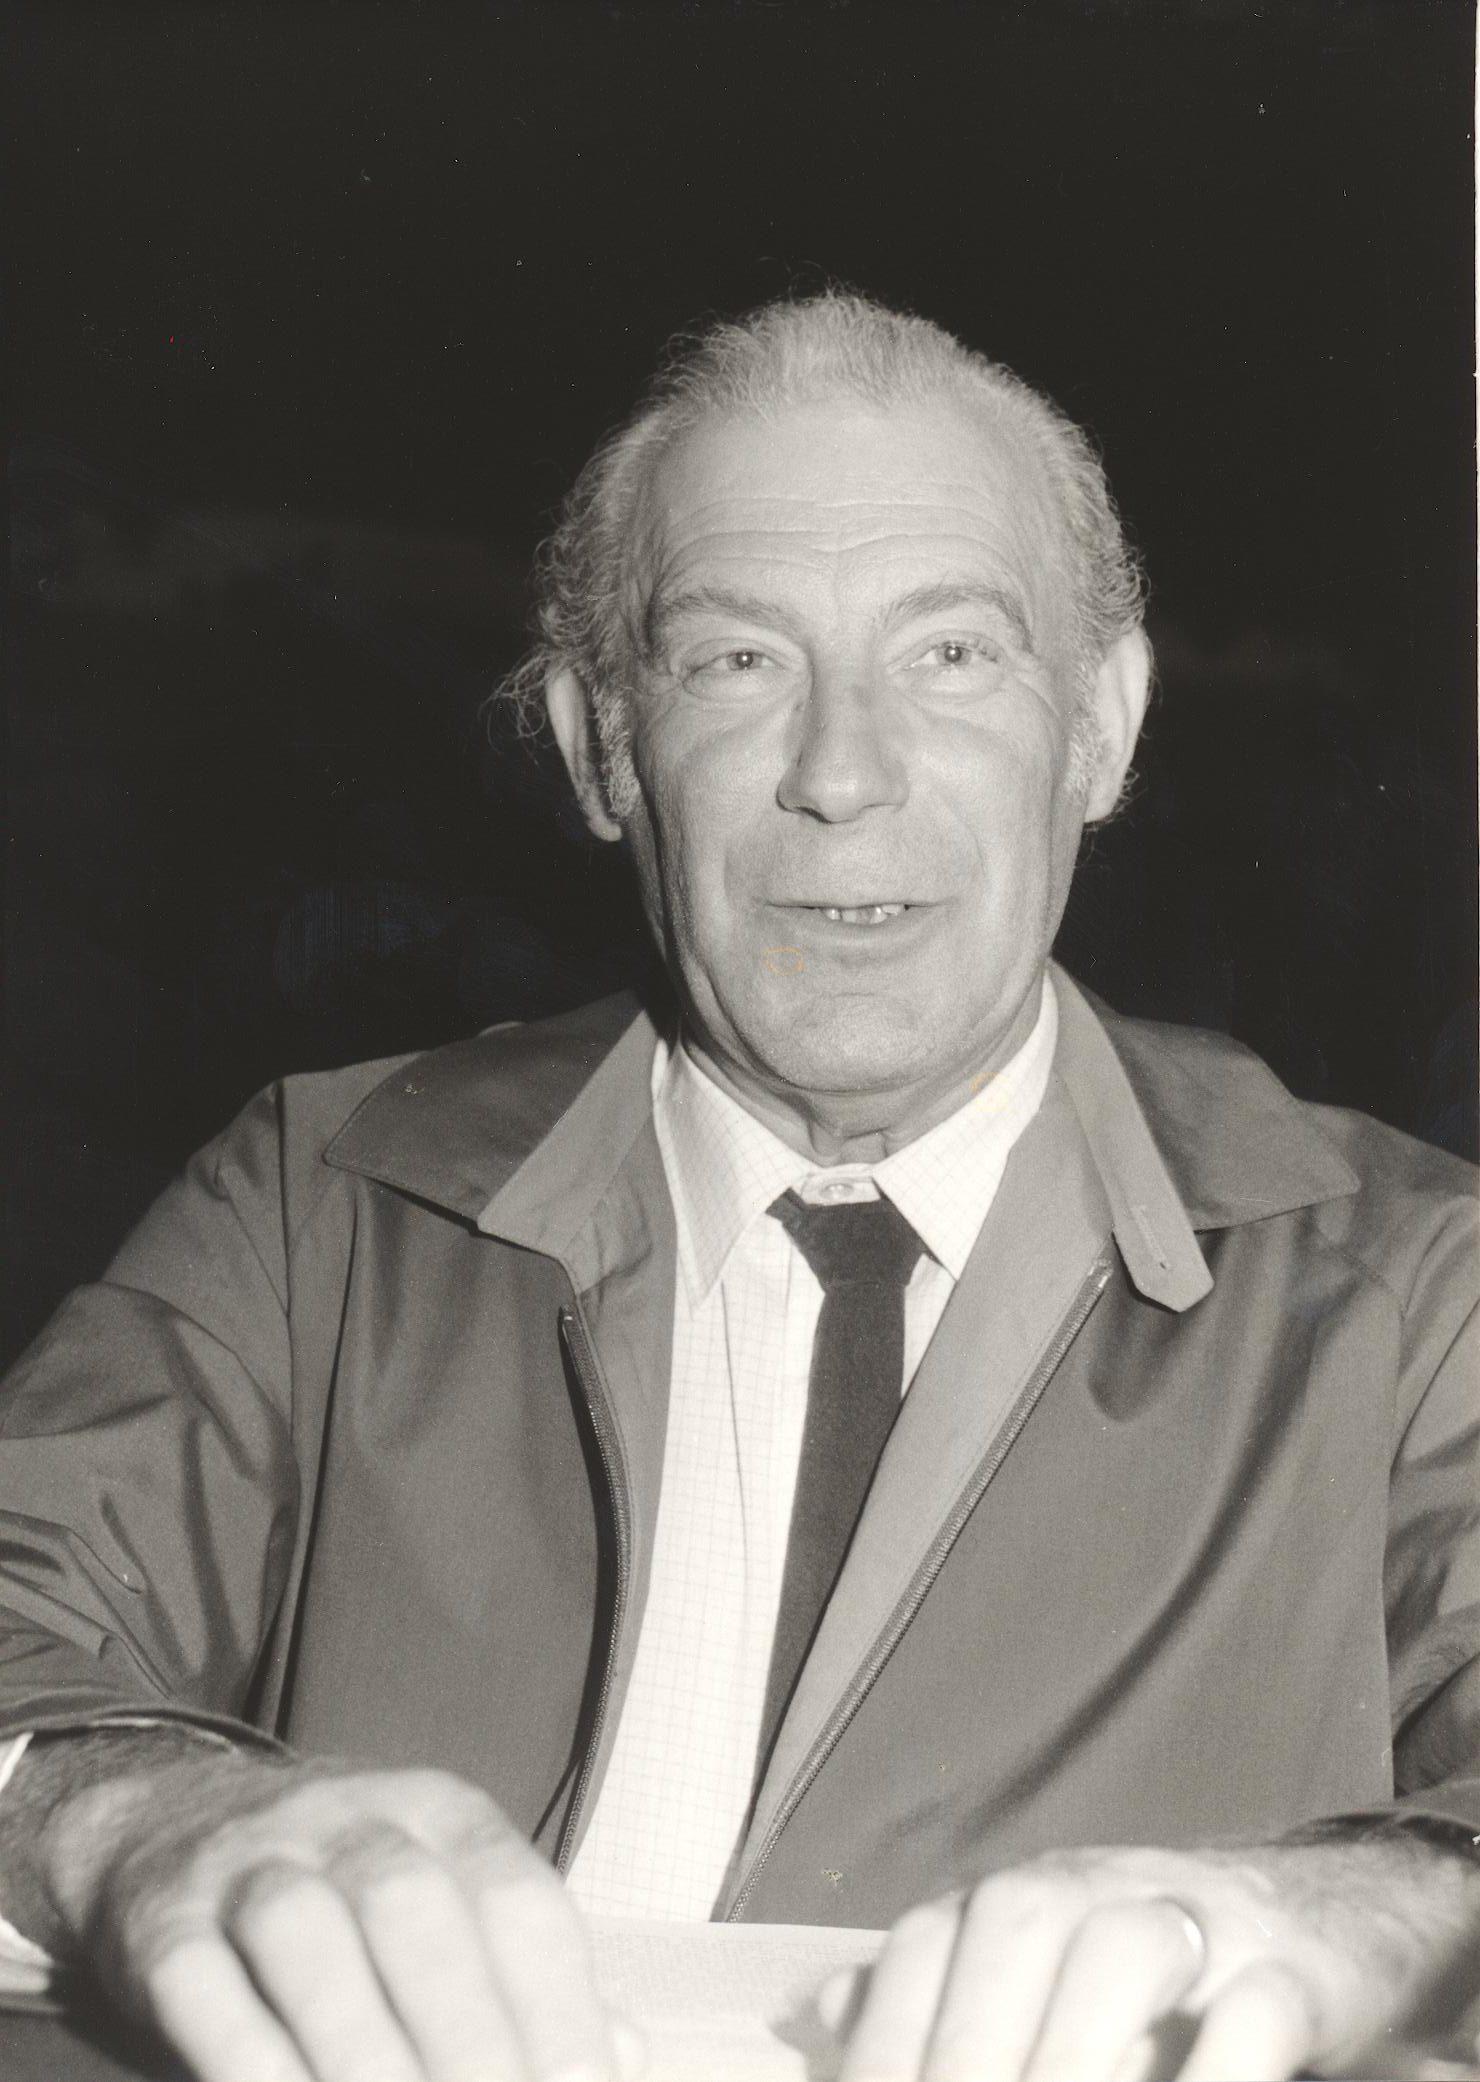 VIII. Internat. Imago Mundi-Kongress 1980, Innsbruck, Prof. Dr. Ernst Senkowski